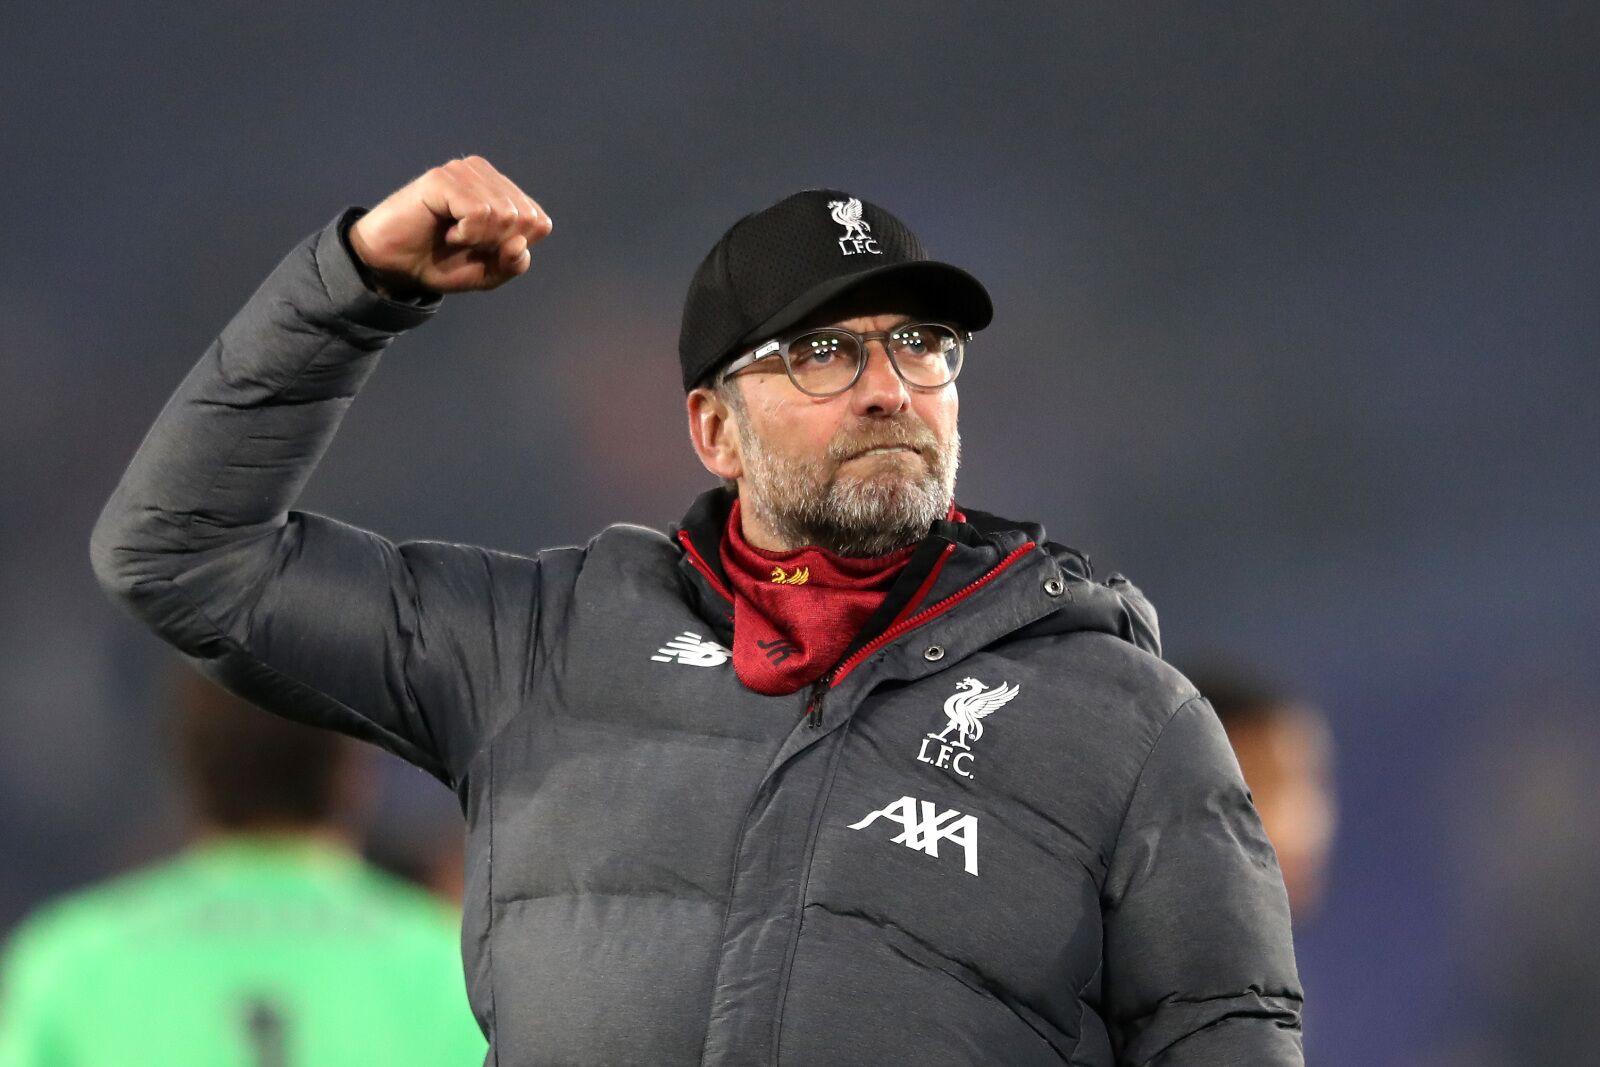 Liverpool: Watch Jurgen Klopp's surprise at seeing John Henry after Man Utd game